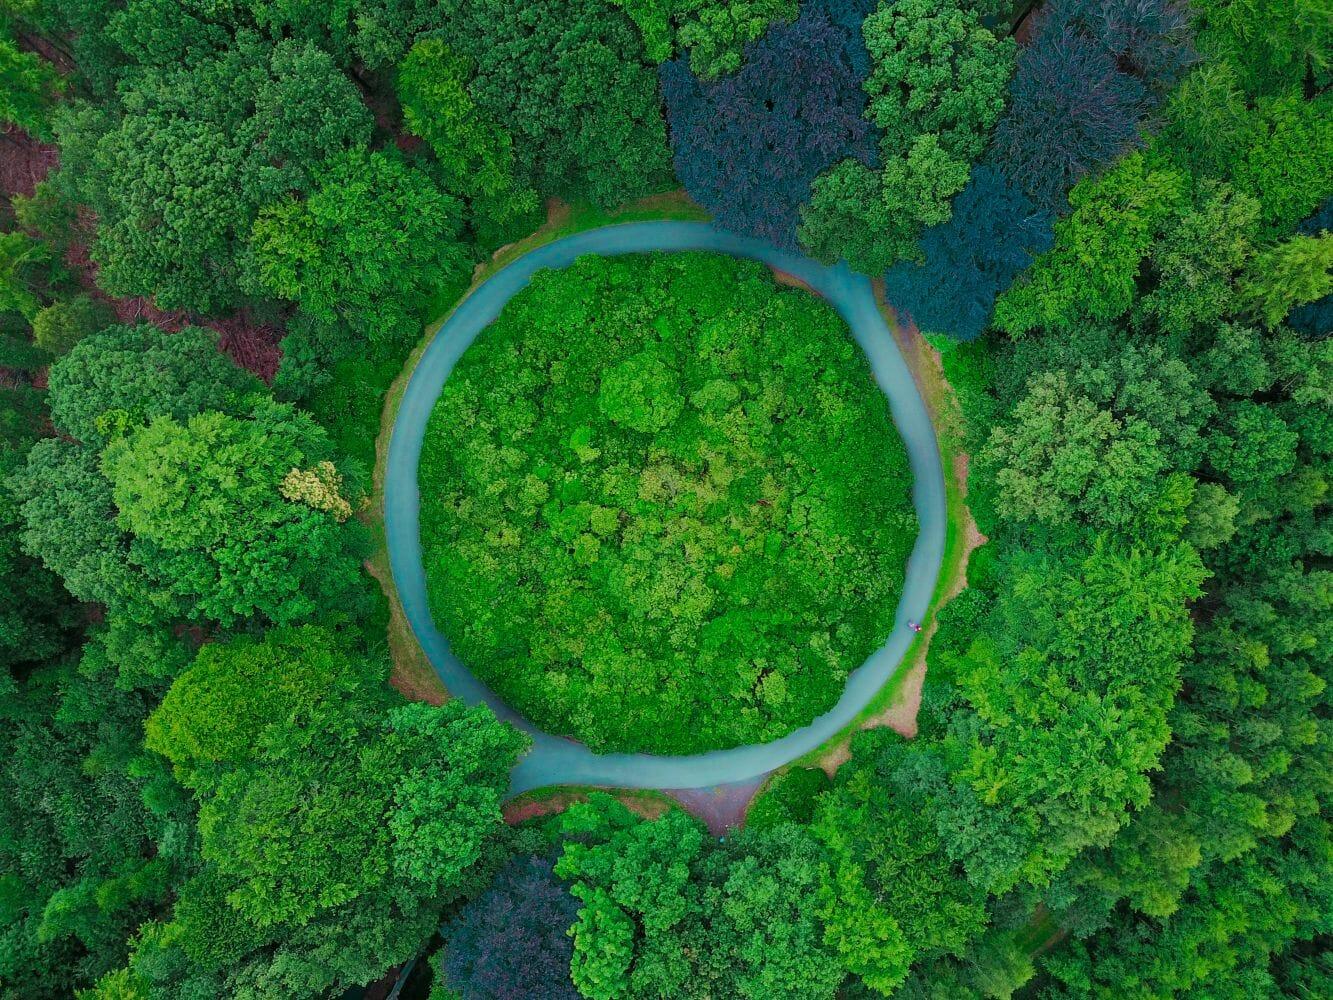 Austrália plantar árvores 2